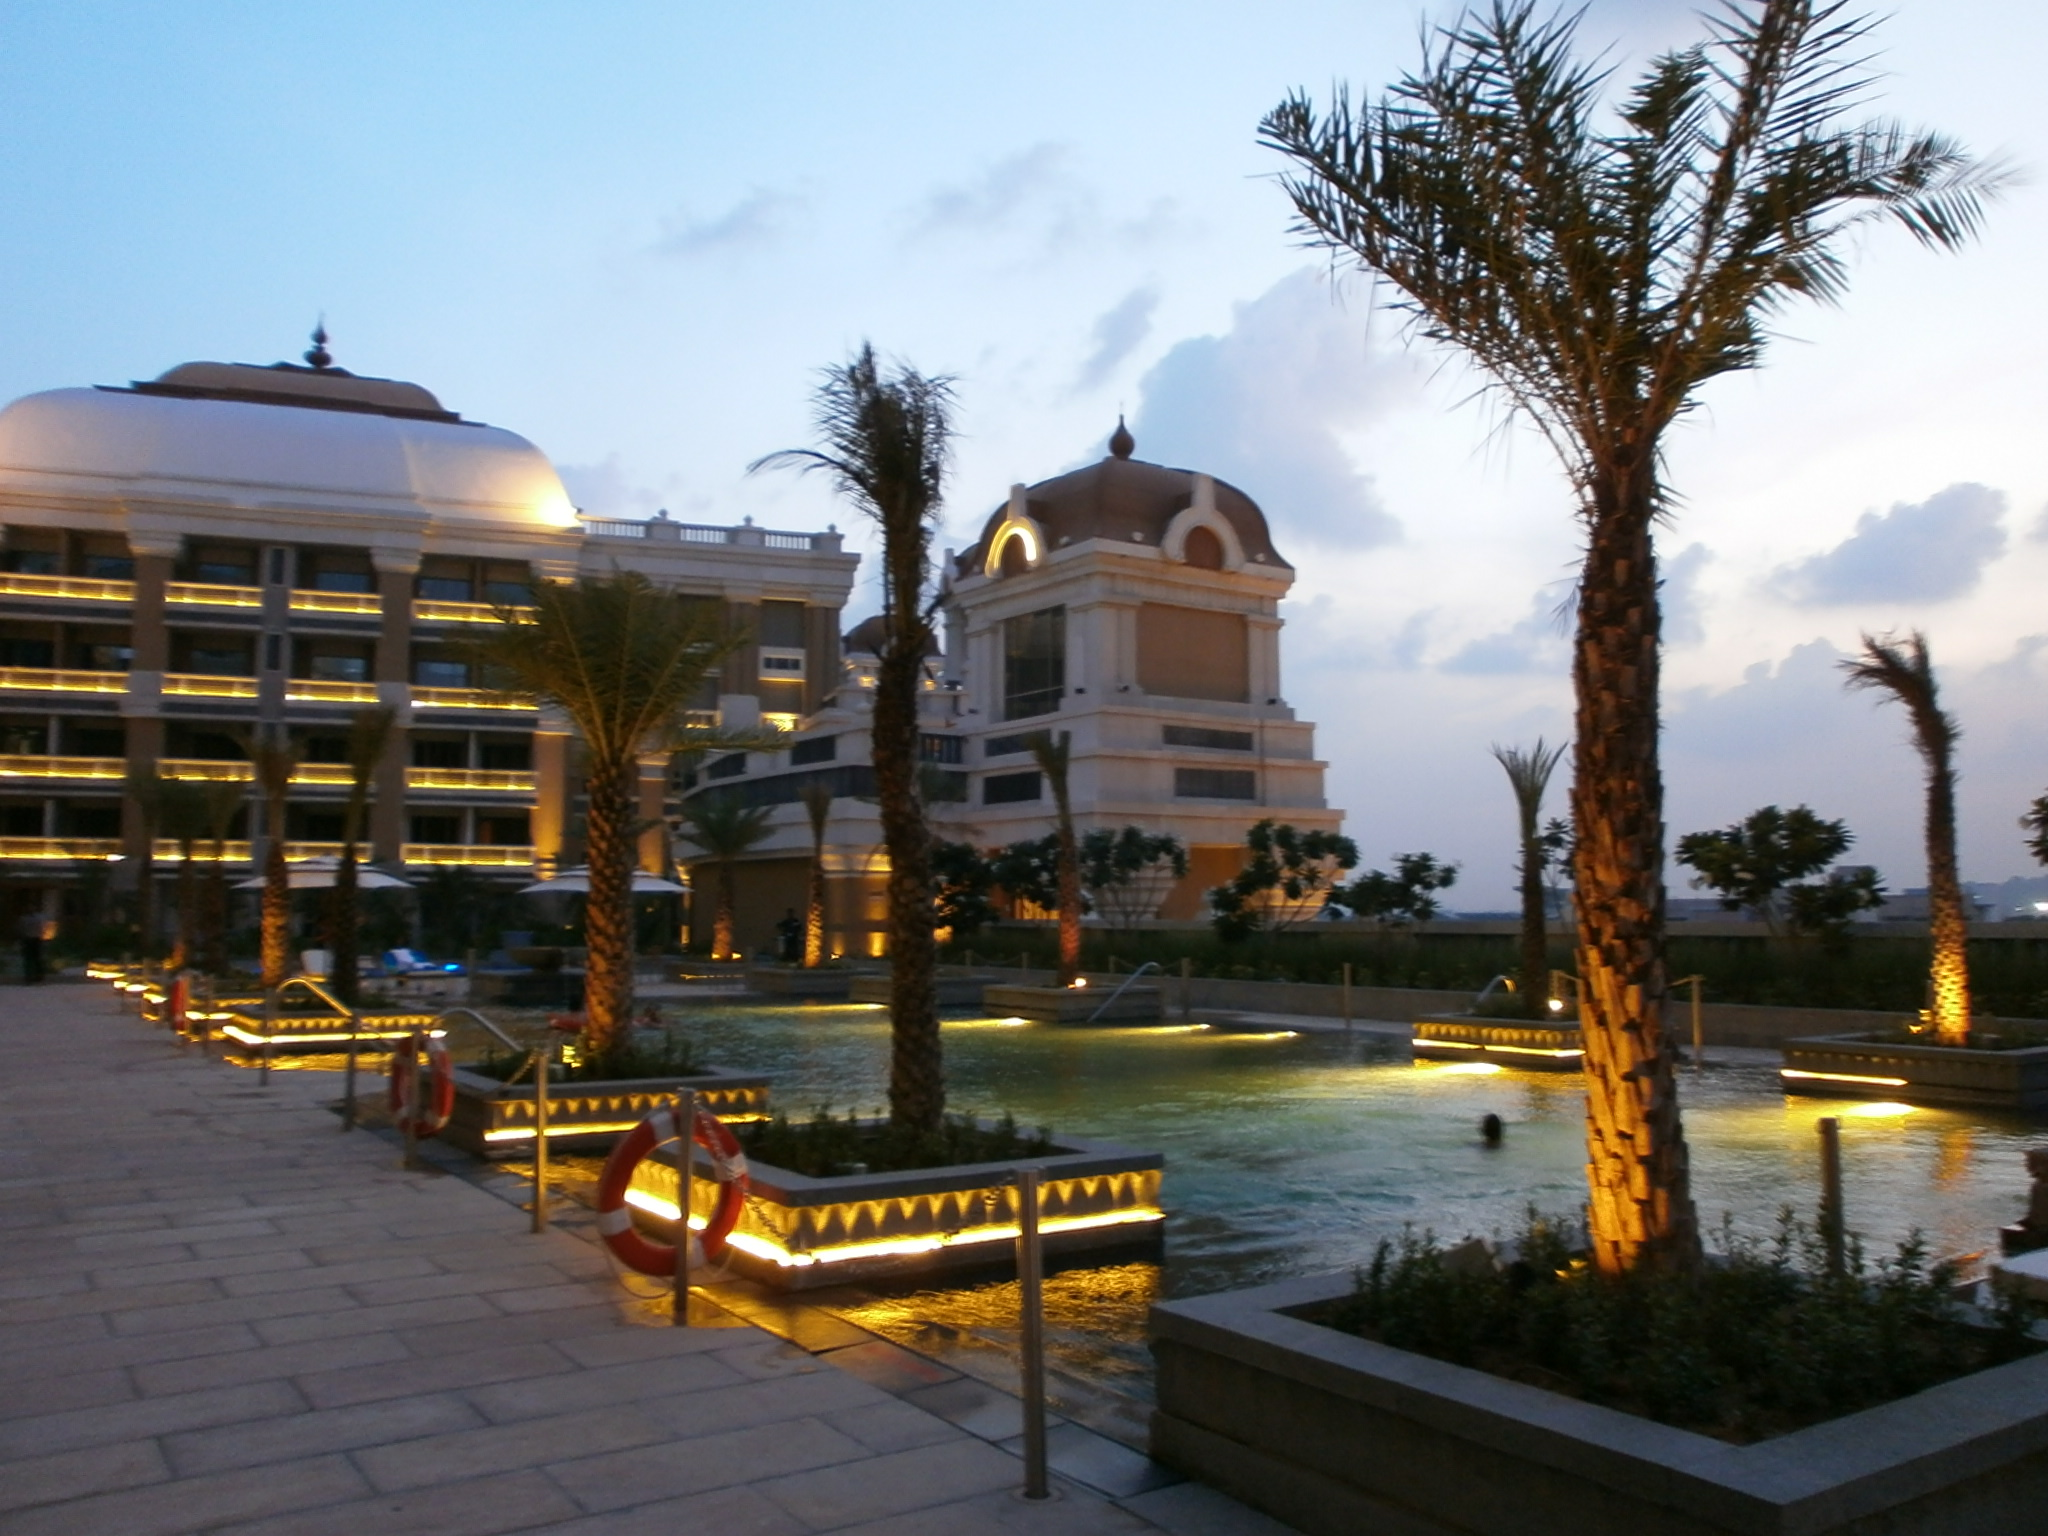 dating hotel i chennai dating en enkemand forum